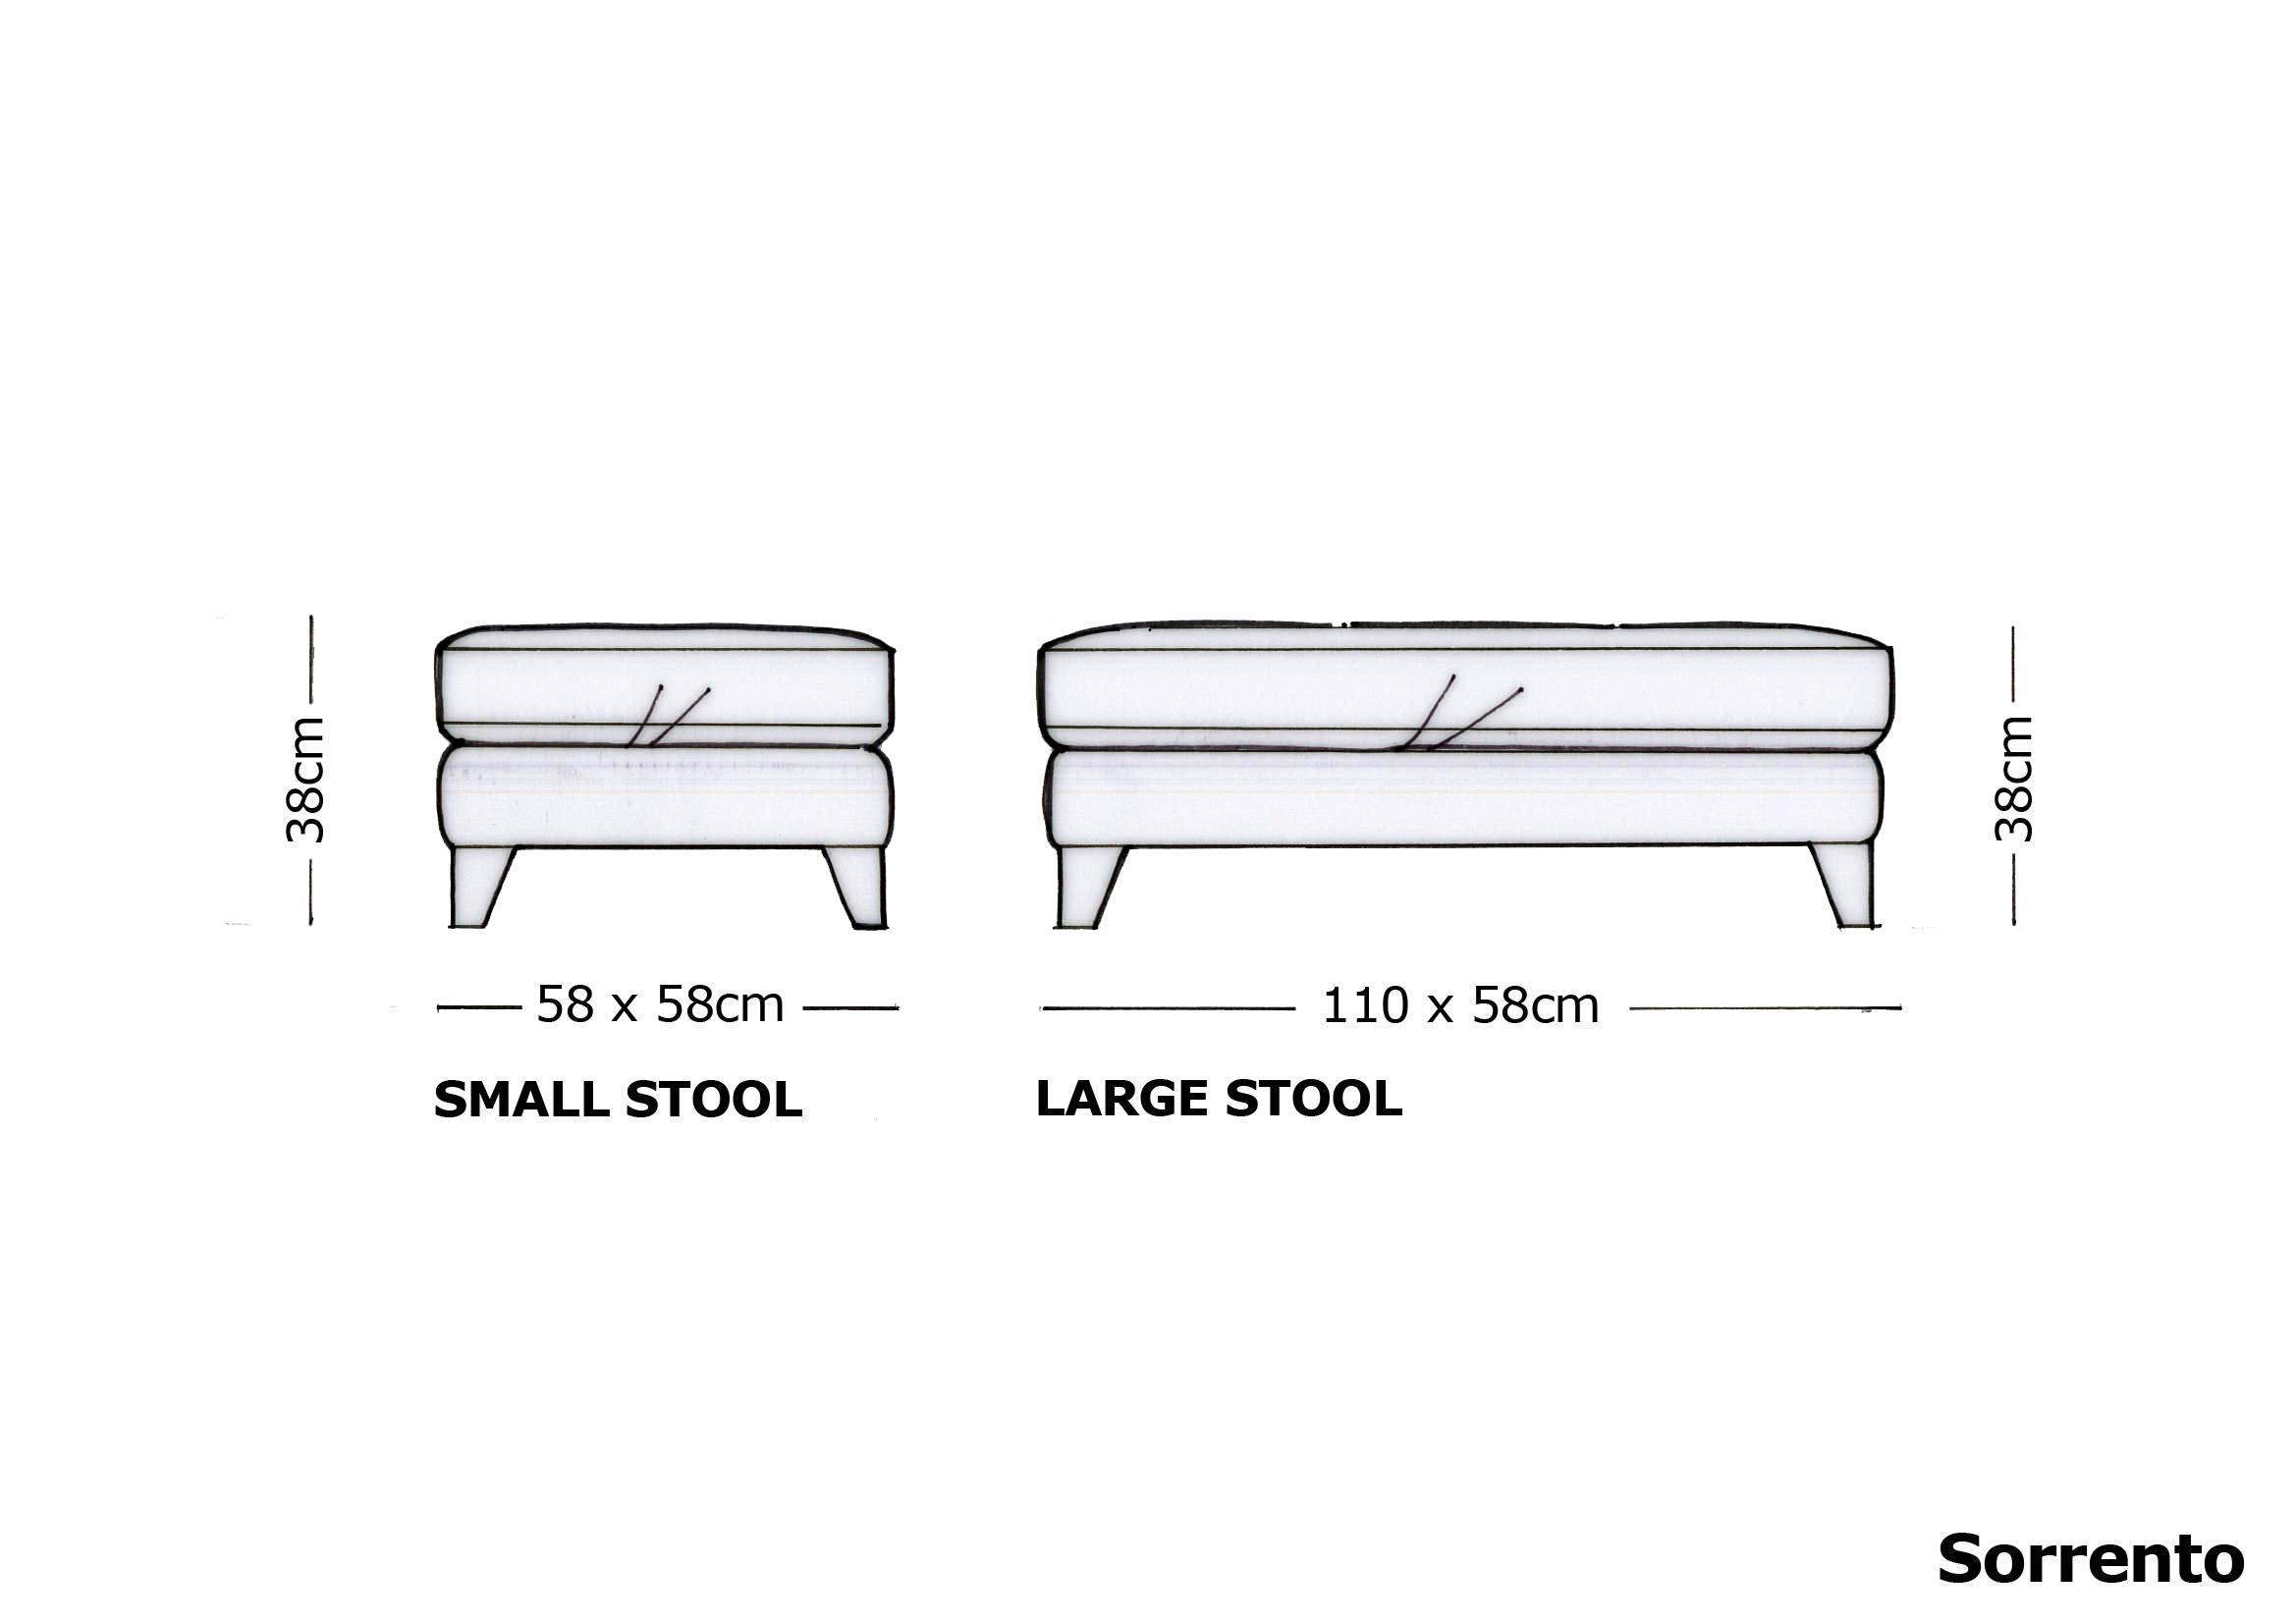 Sorrento Stool Dimensions.jpg